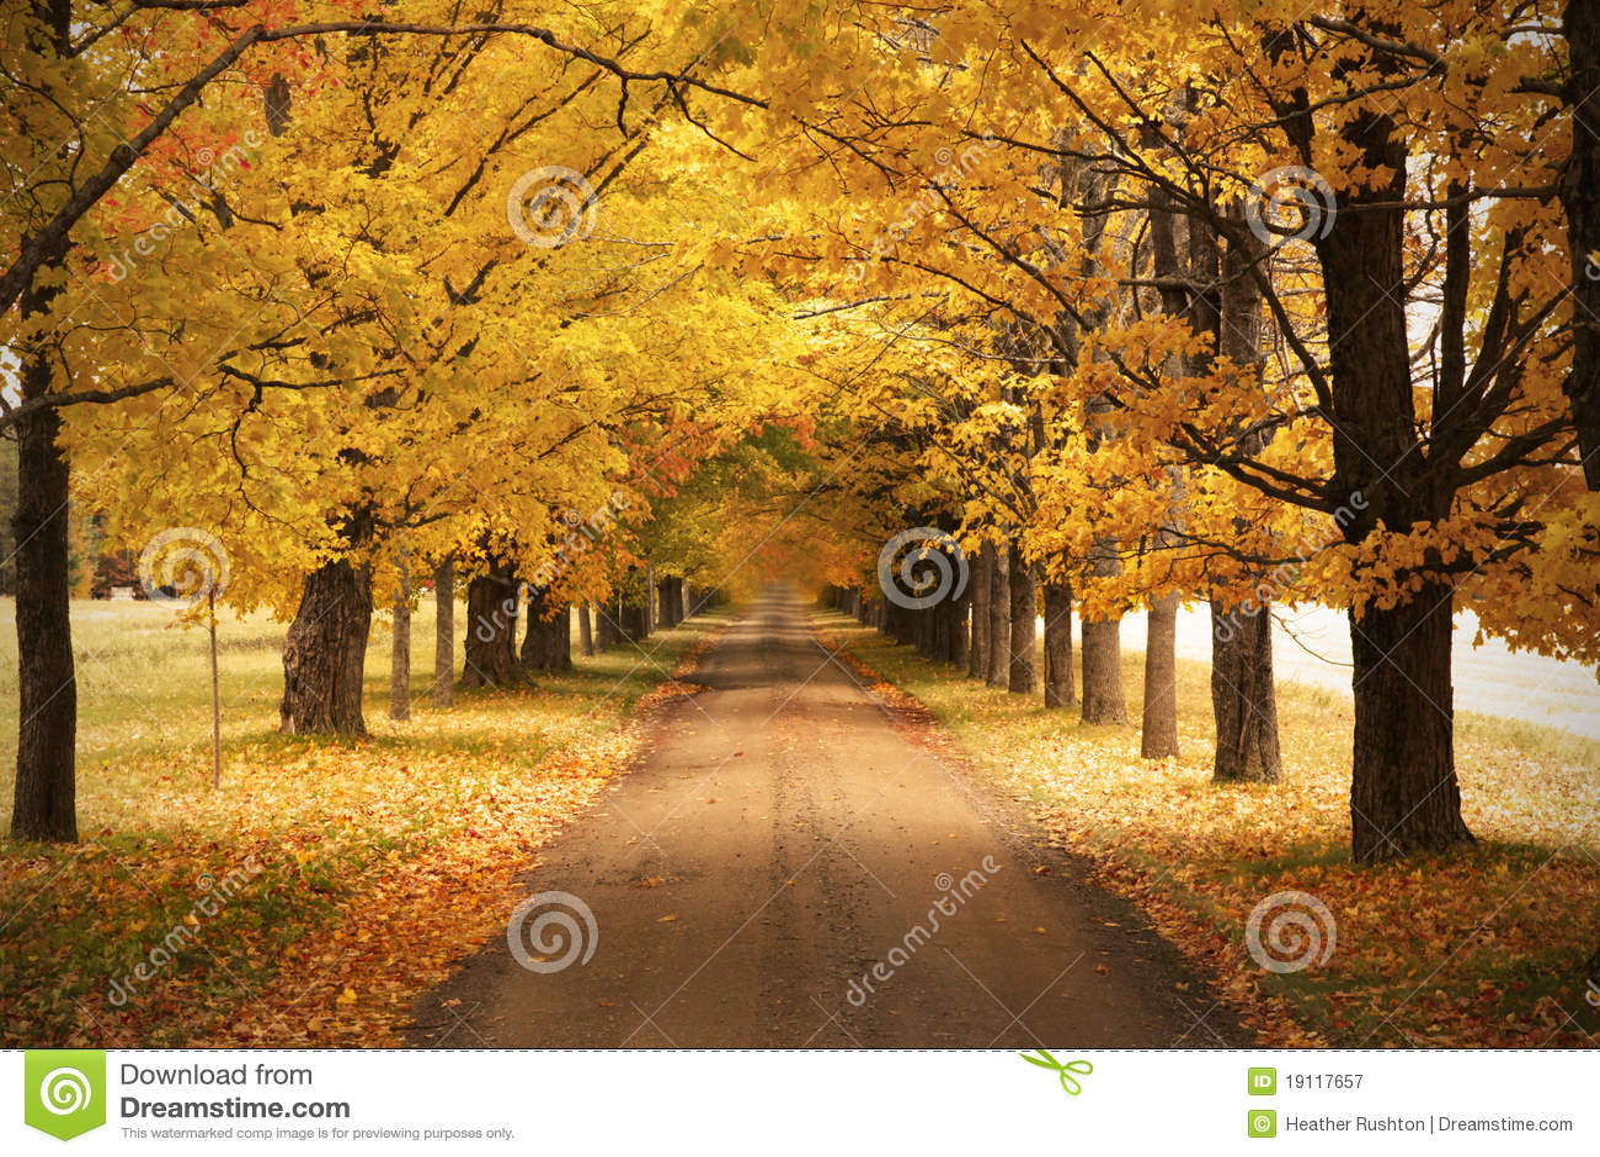 Fall Foliage Computer Wallpaper Autumn Road Stock Image Image Of Color Autumn Fallen